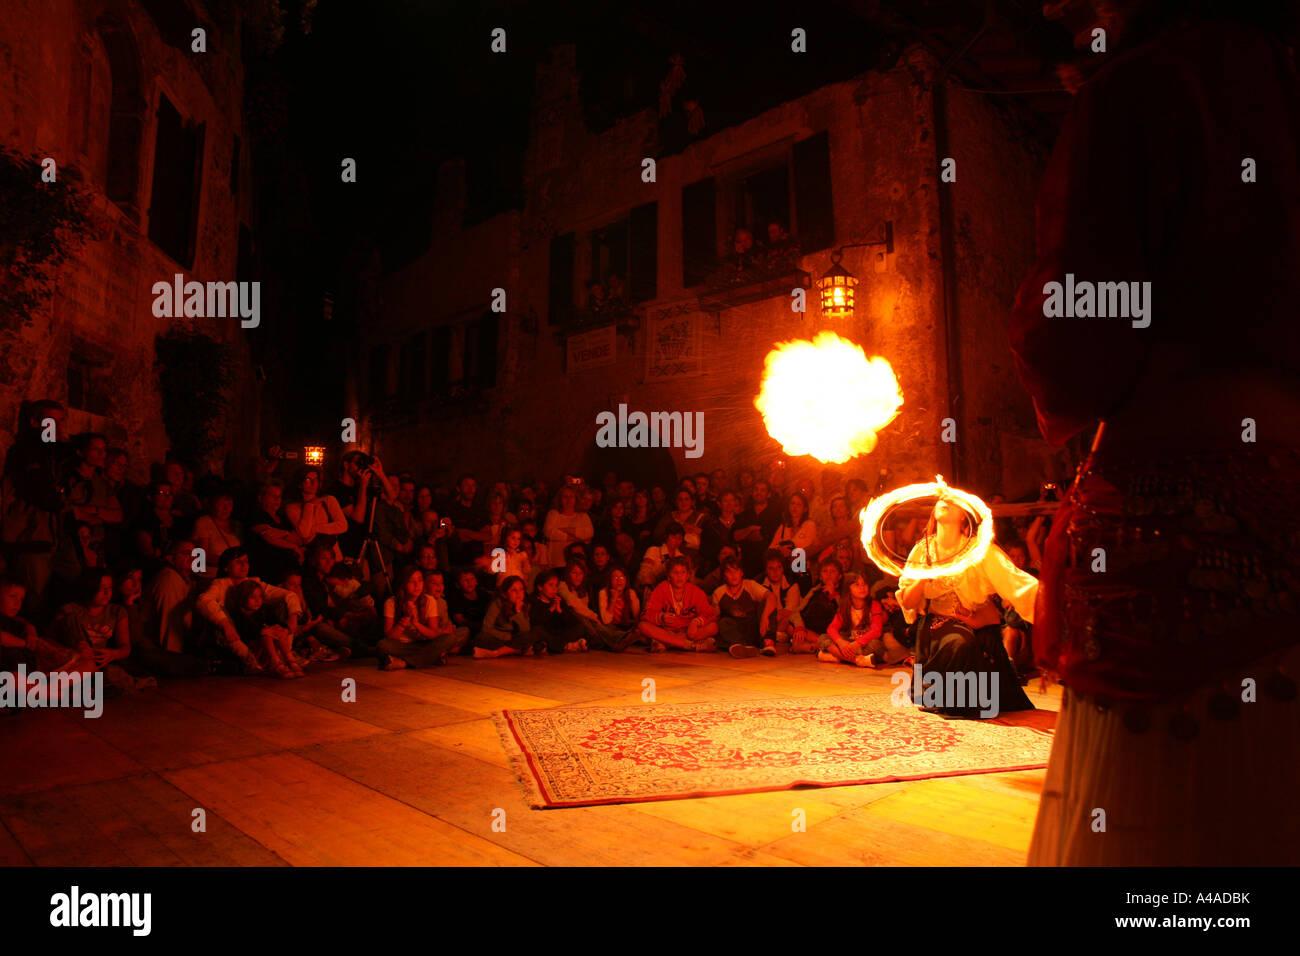 Enterttainment with fire during Rustico Medioevo manifestation Canale di Tenno Trentino Alto Adige Italy - Stock Image